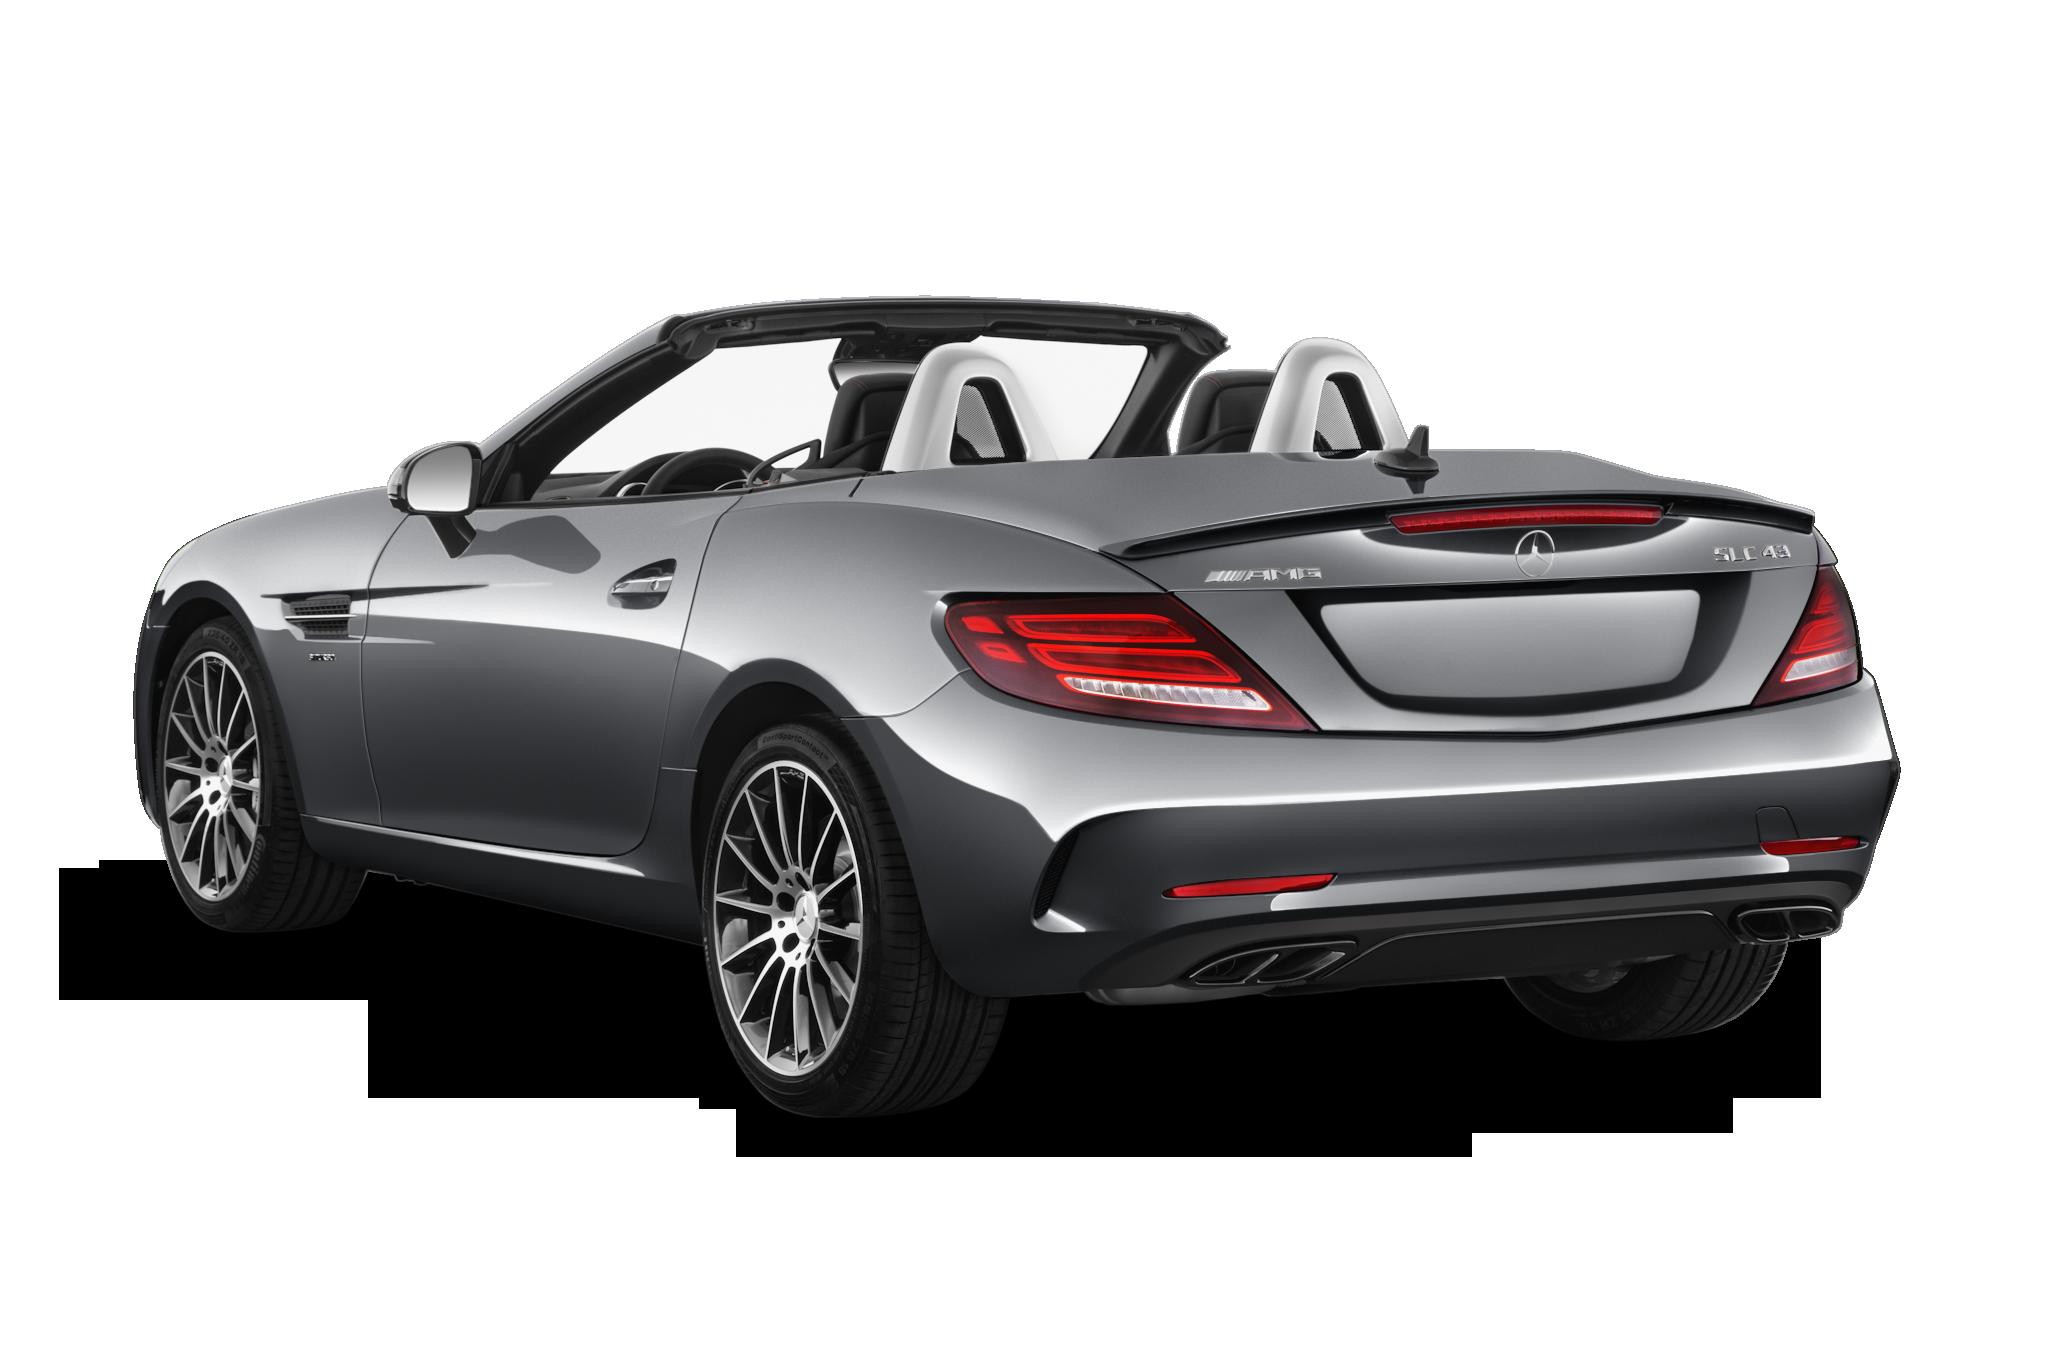 2017 mercedes benz slc class review for Mercedes benz roadster 2017